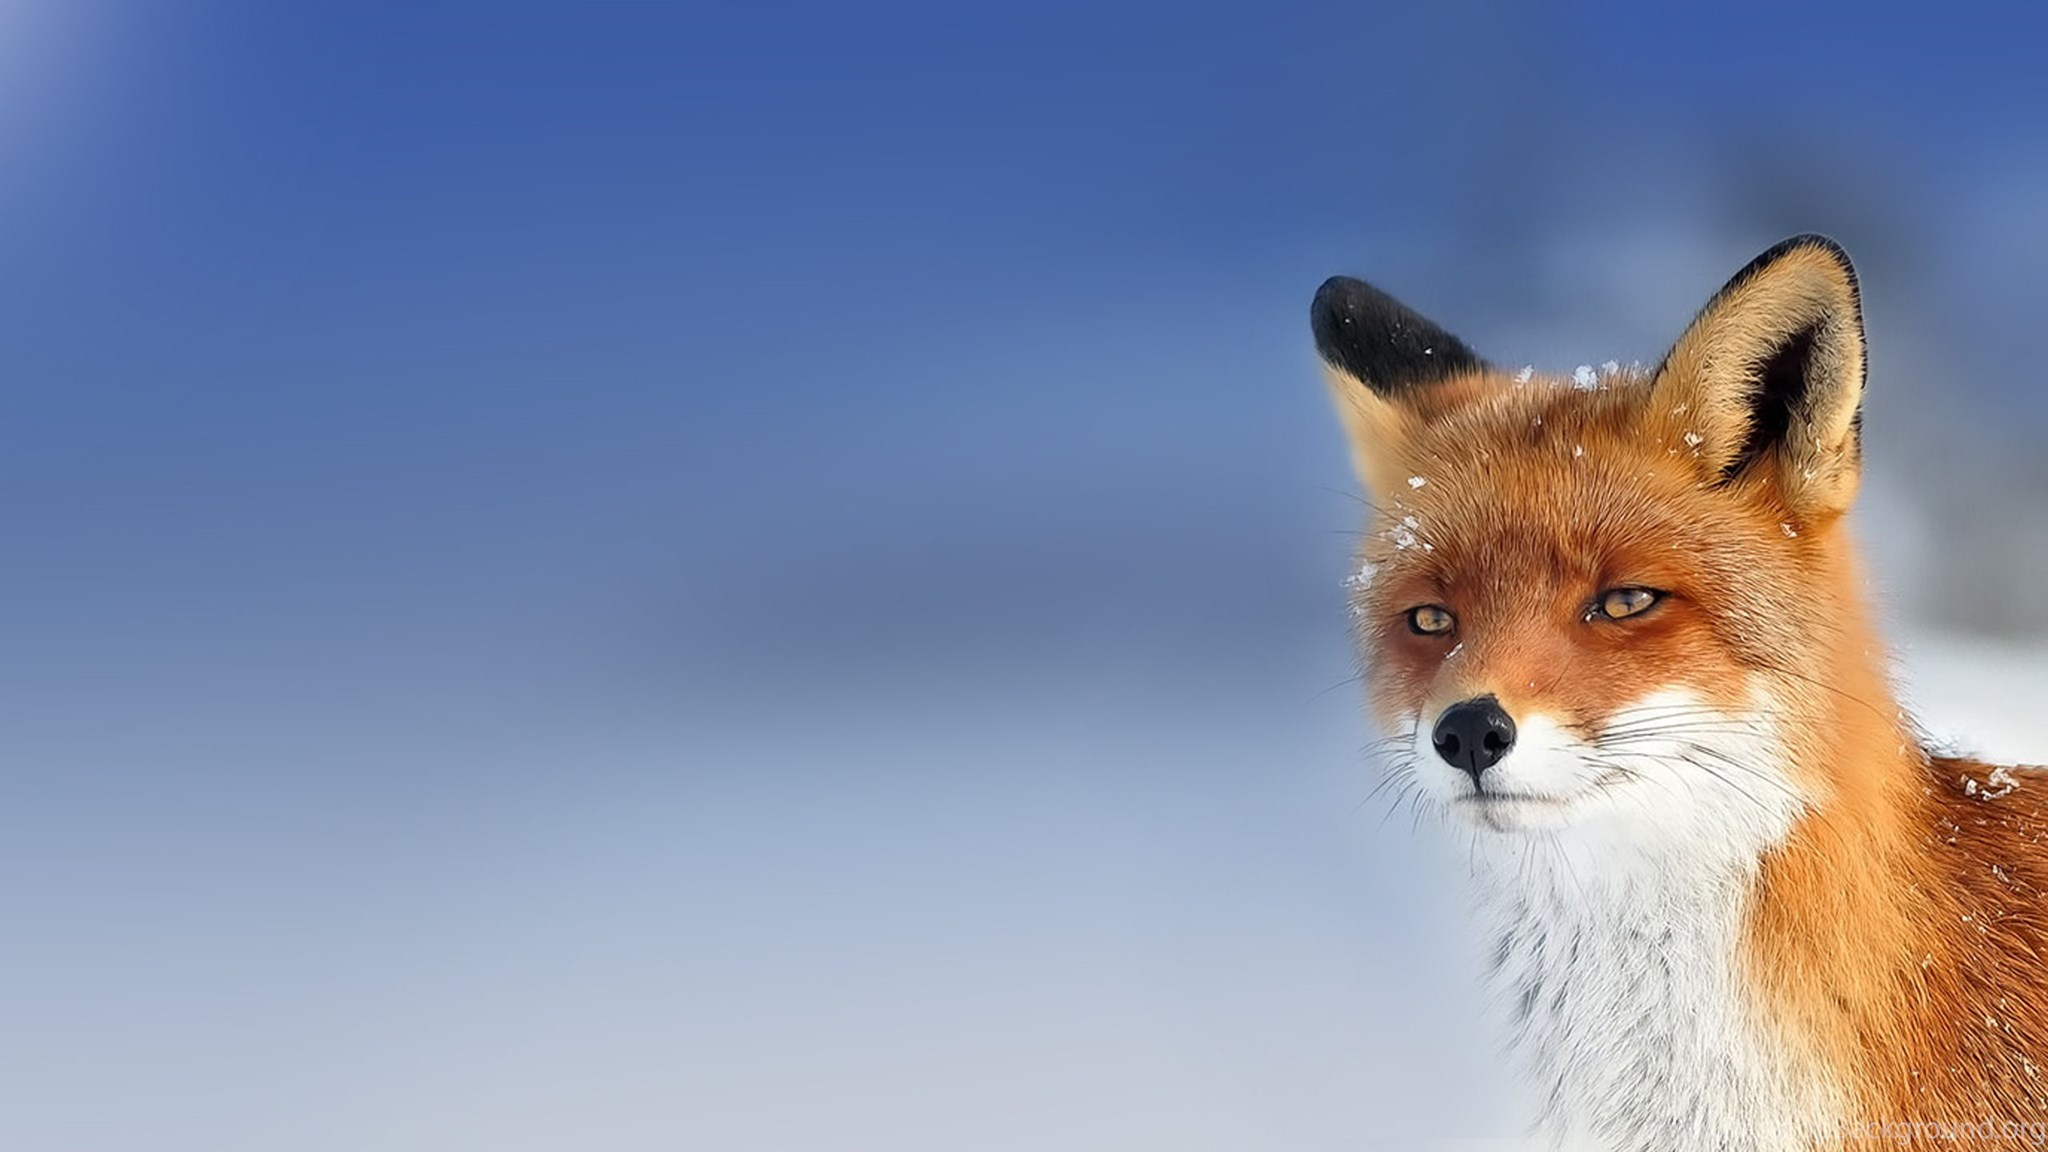 Hd beautiful wild fox wallpapers hd full size - Fox desktop background ...